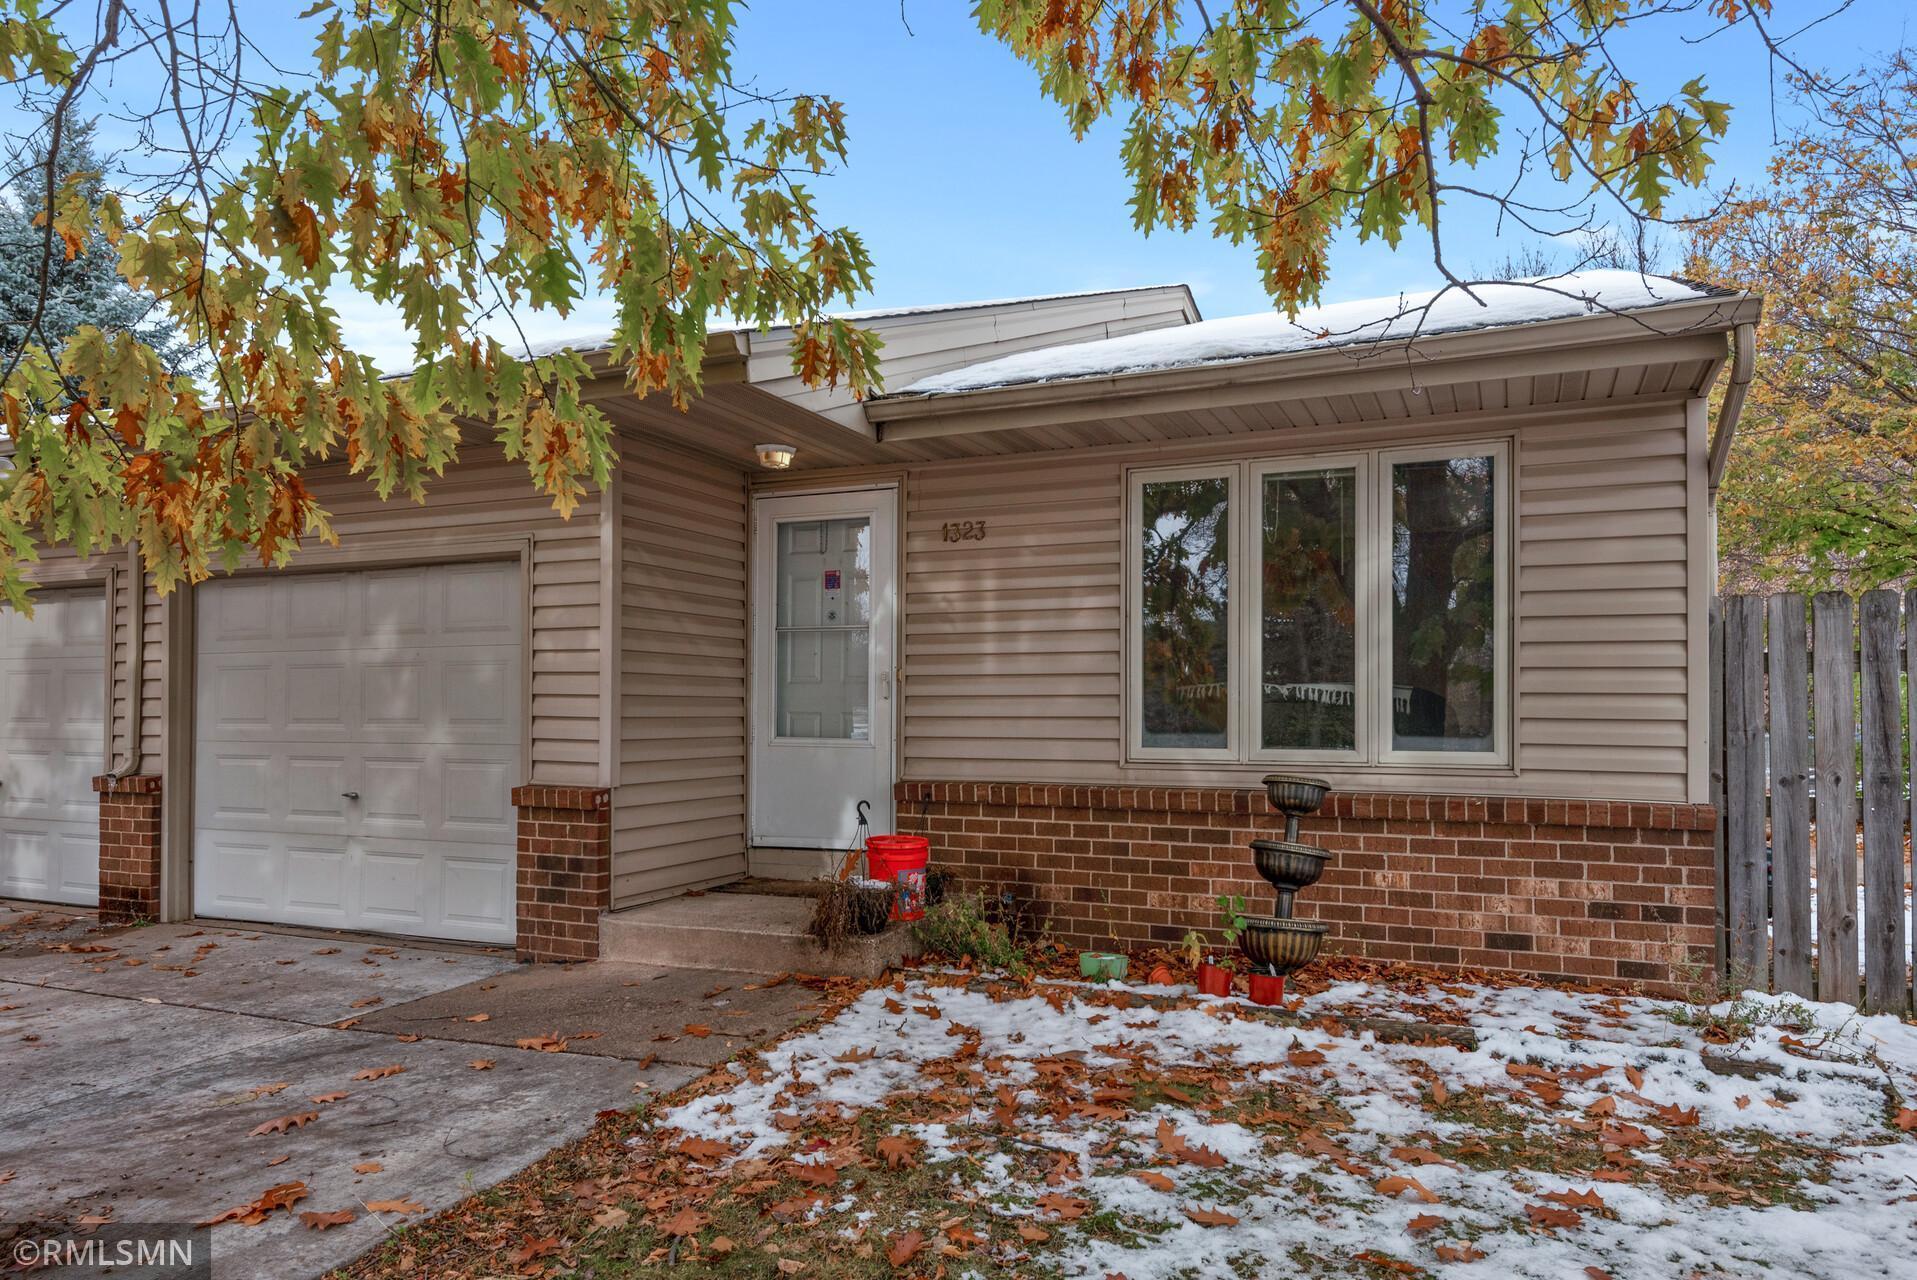 1313 73rd Avenue NE Property Photo - Fridley, MN real estate listing